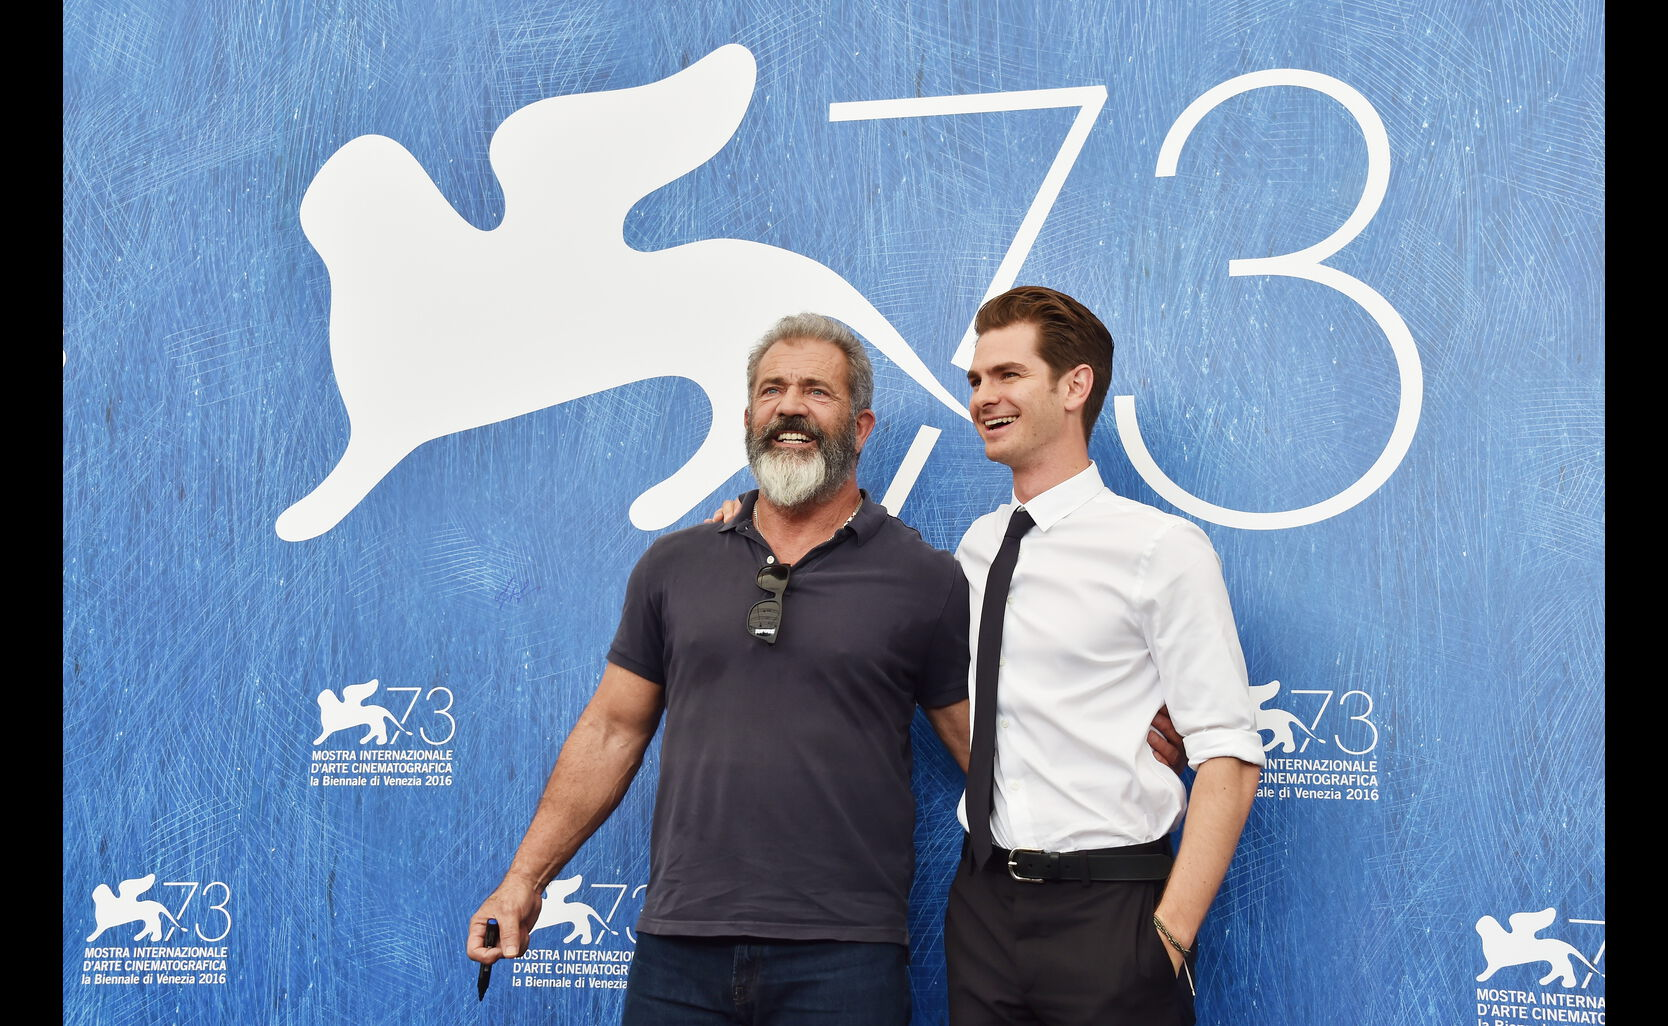 Golden Globe winner Mel Gibson and Golden Globe nominee Andrew Garfield